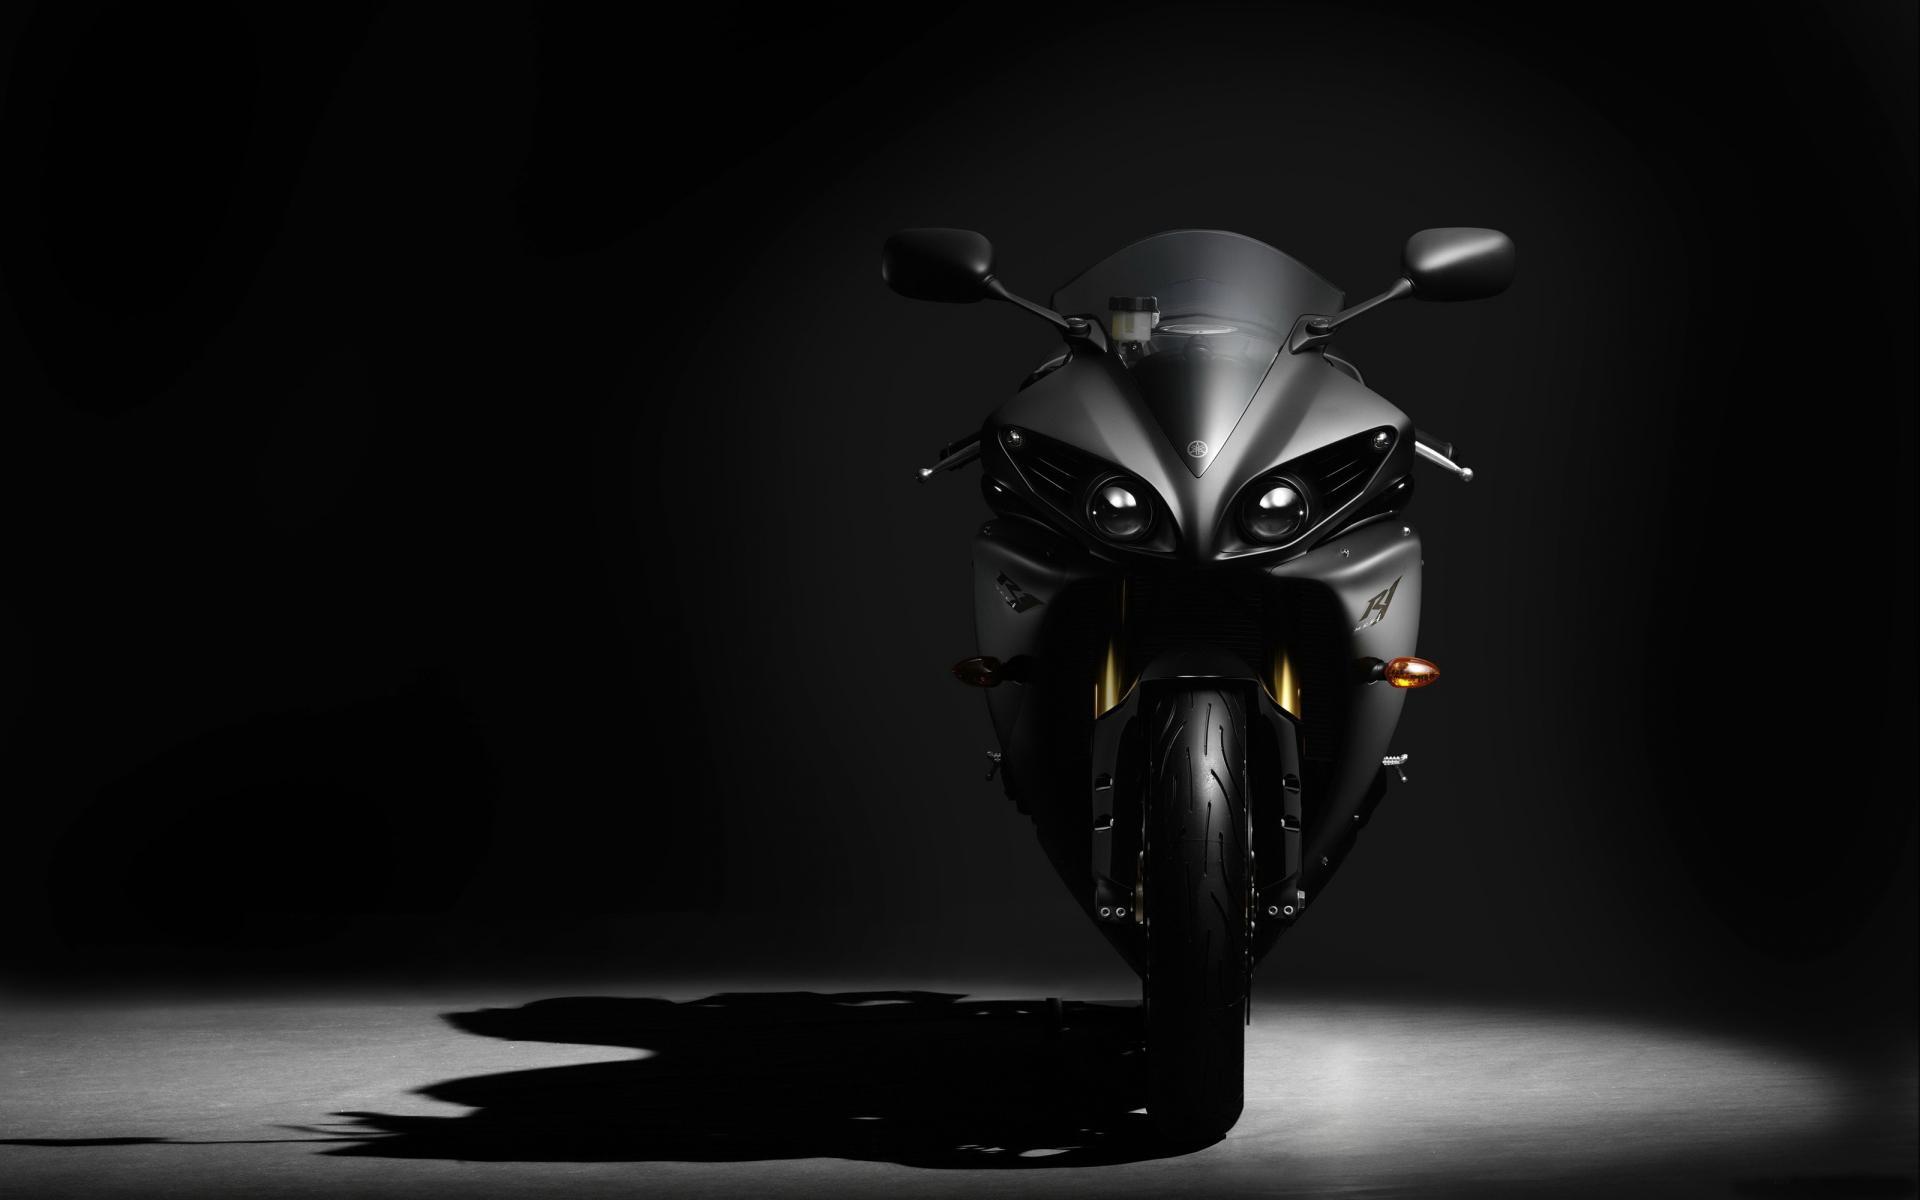 Black Bike Wallpaper 33153